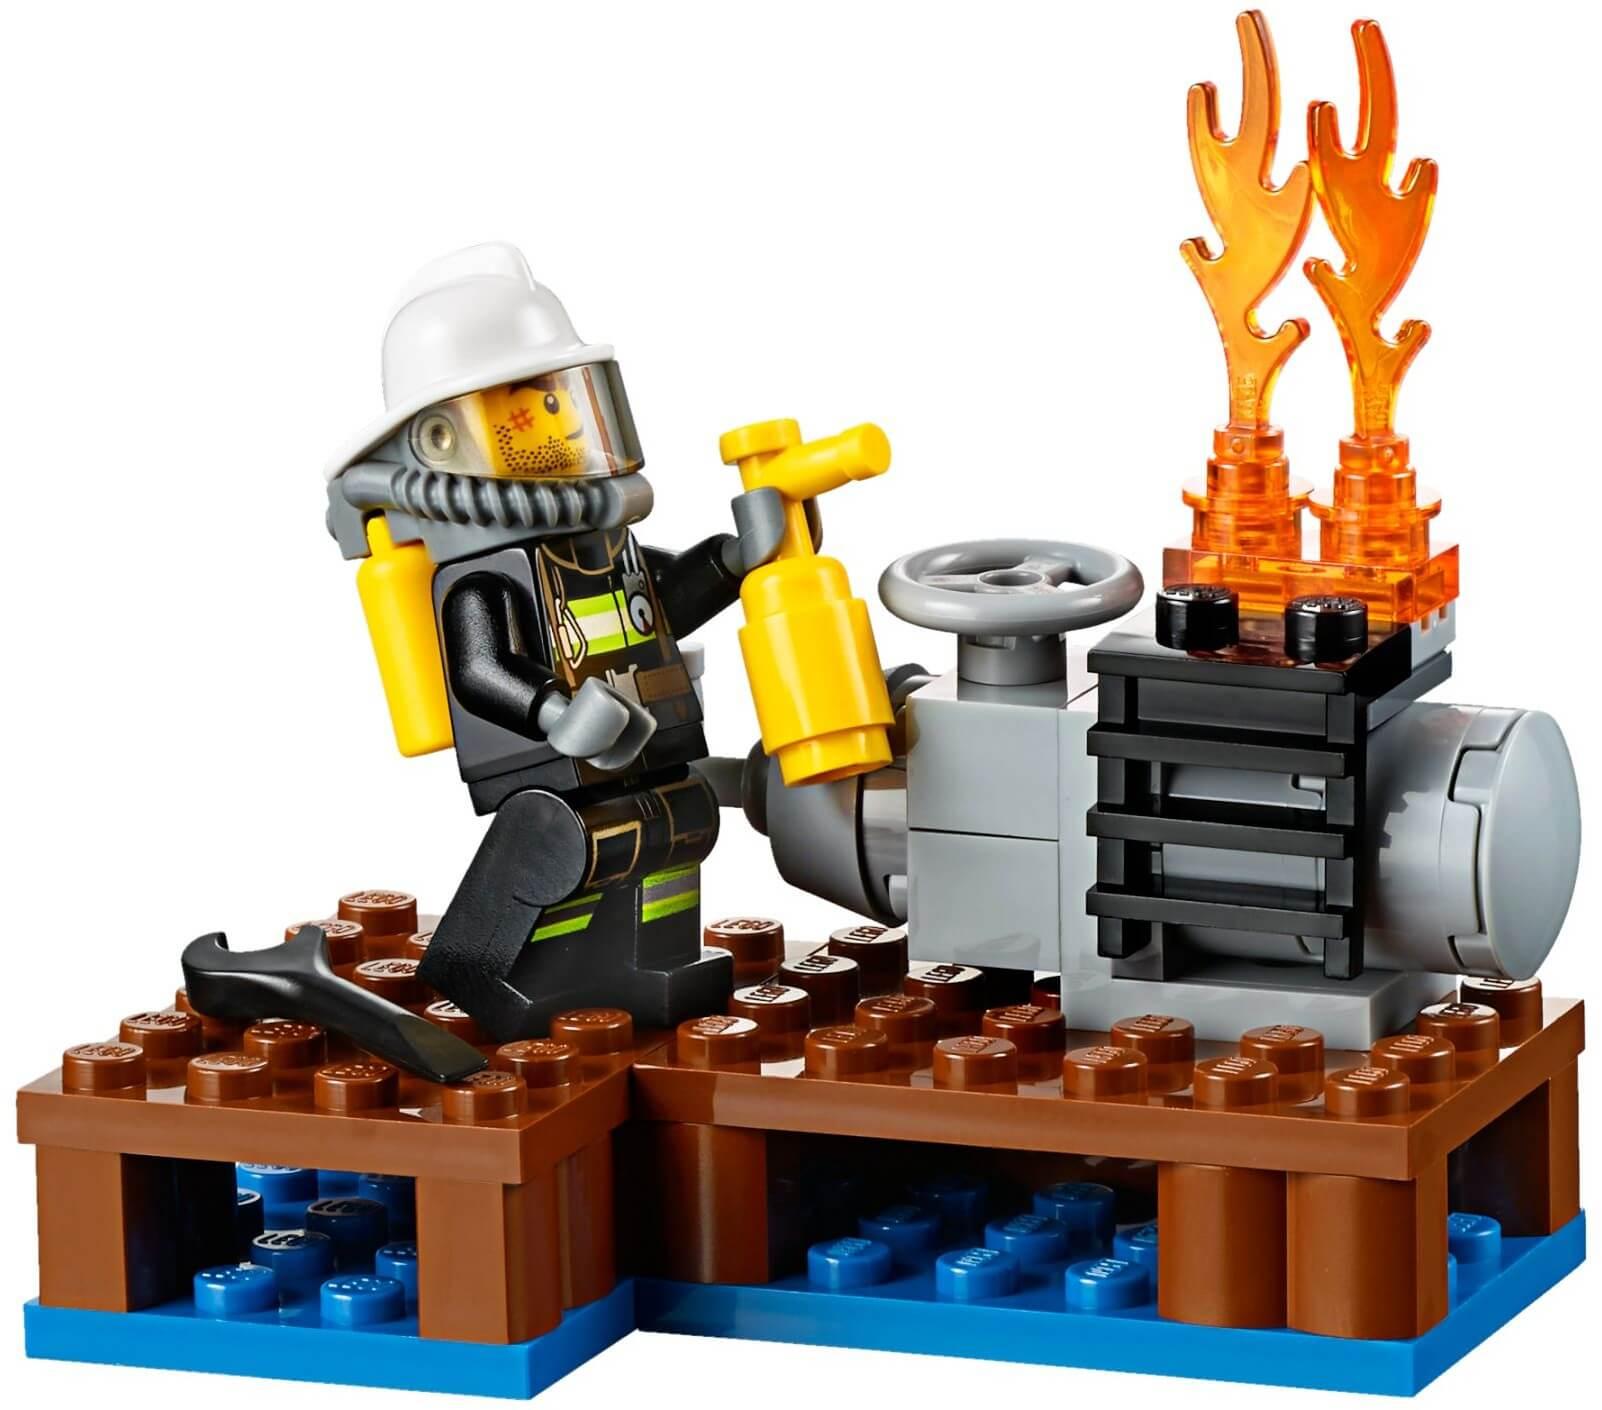 Mua đồ chơi LEGO 60106 - LEGO City 60106 - Đội Lính Cứu Hỏa (LEGO City Fire Starter Set 60106)